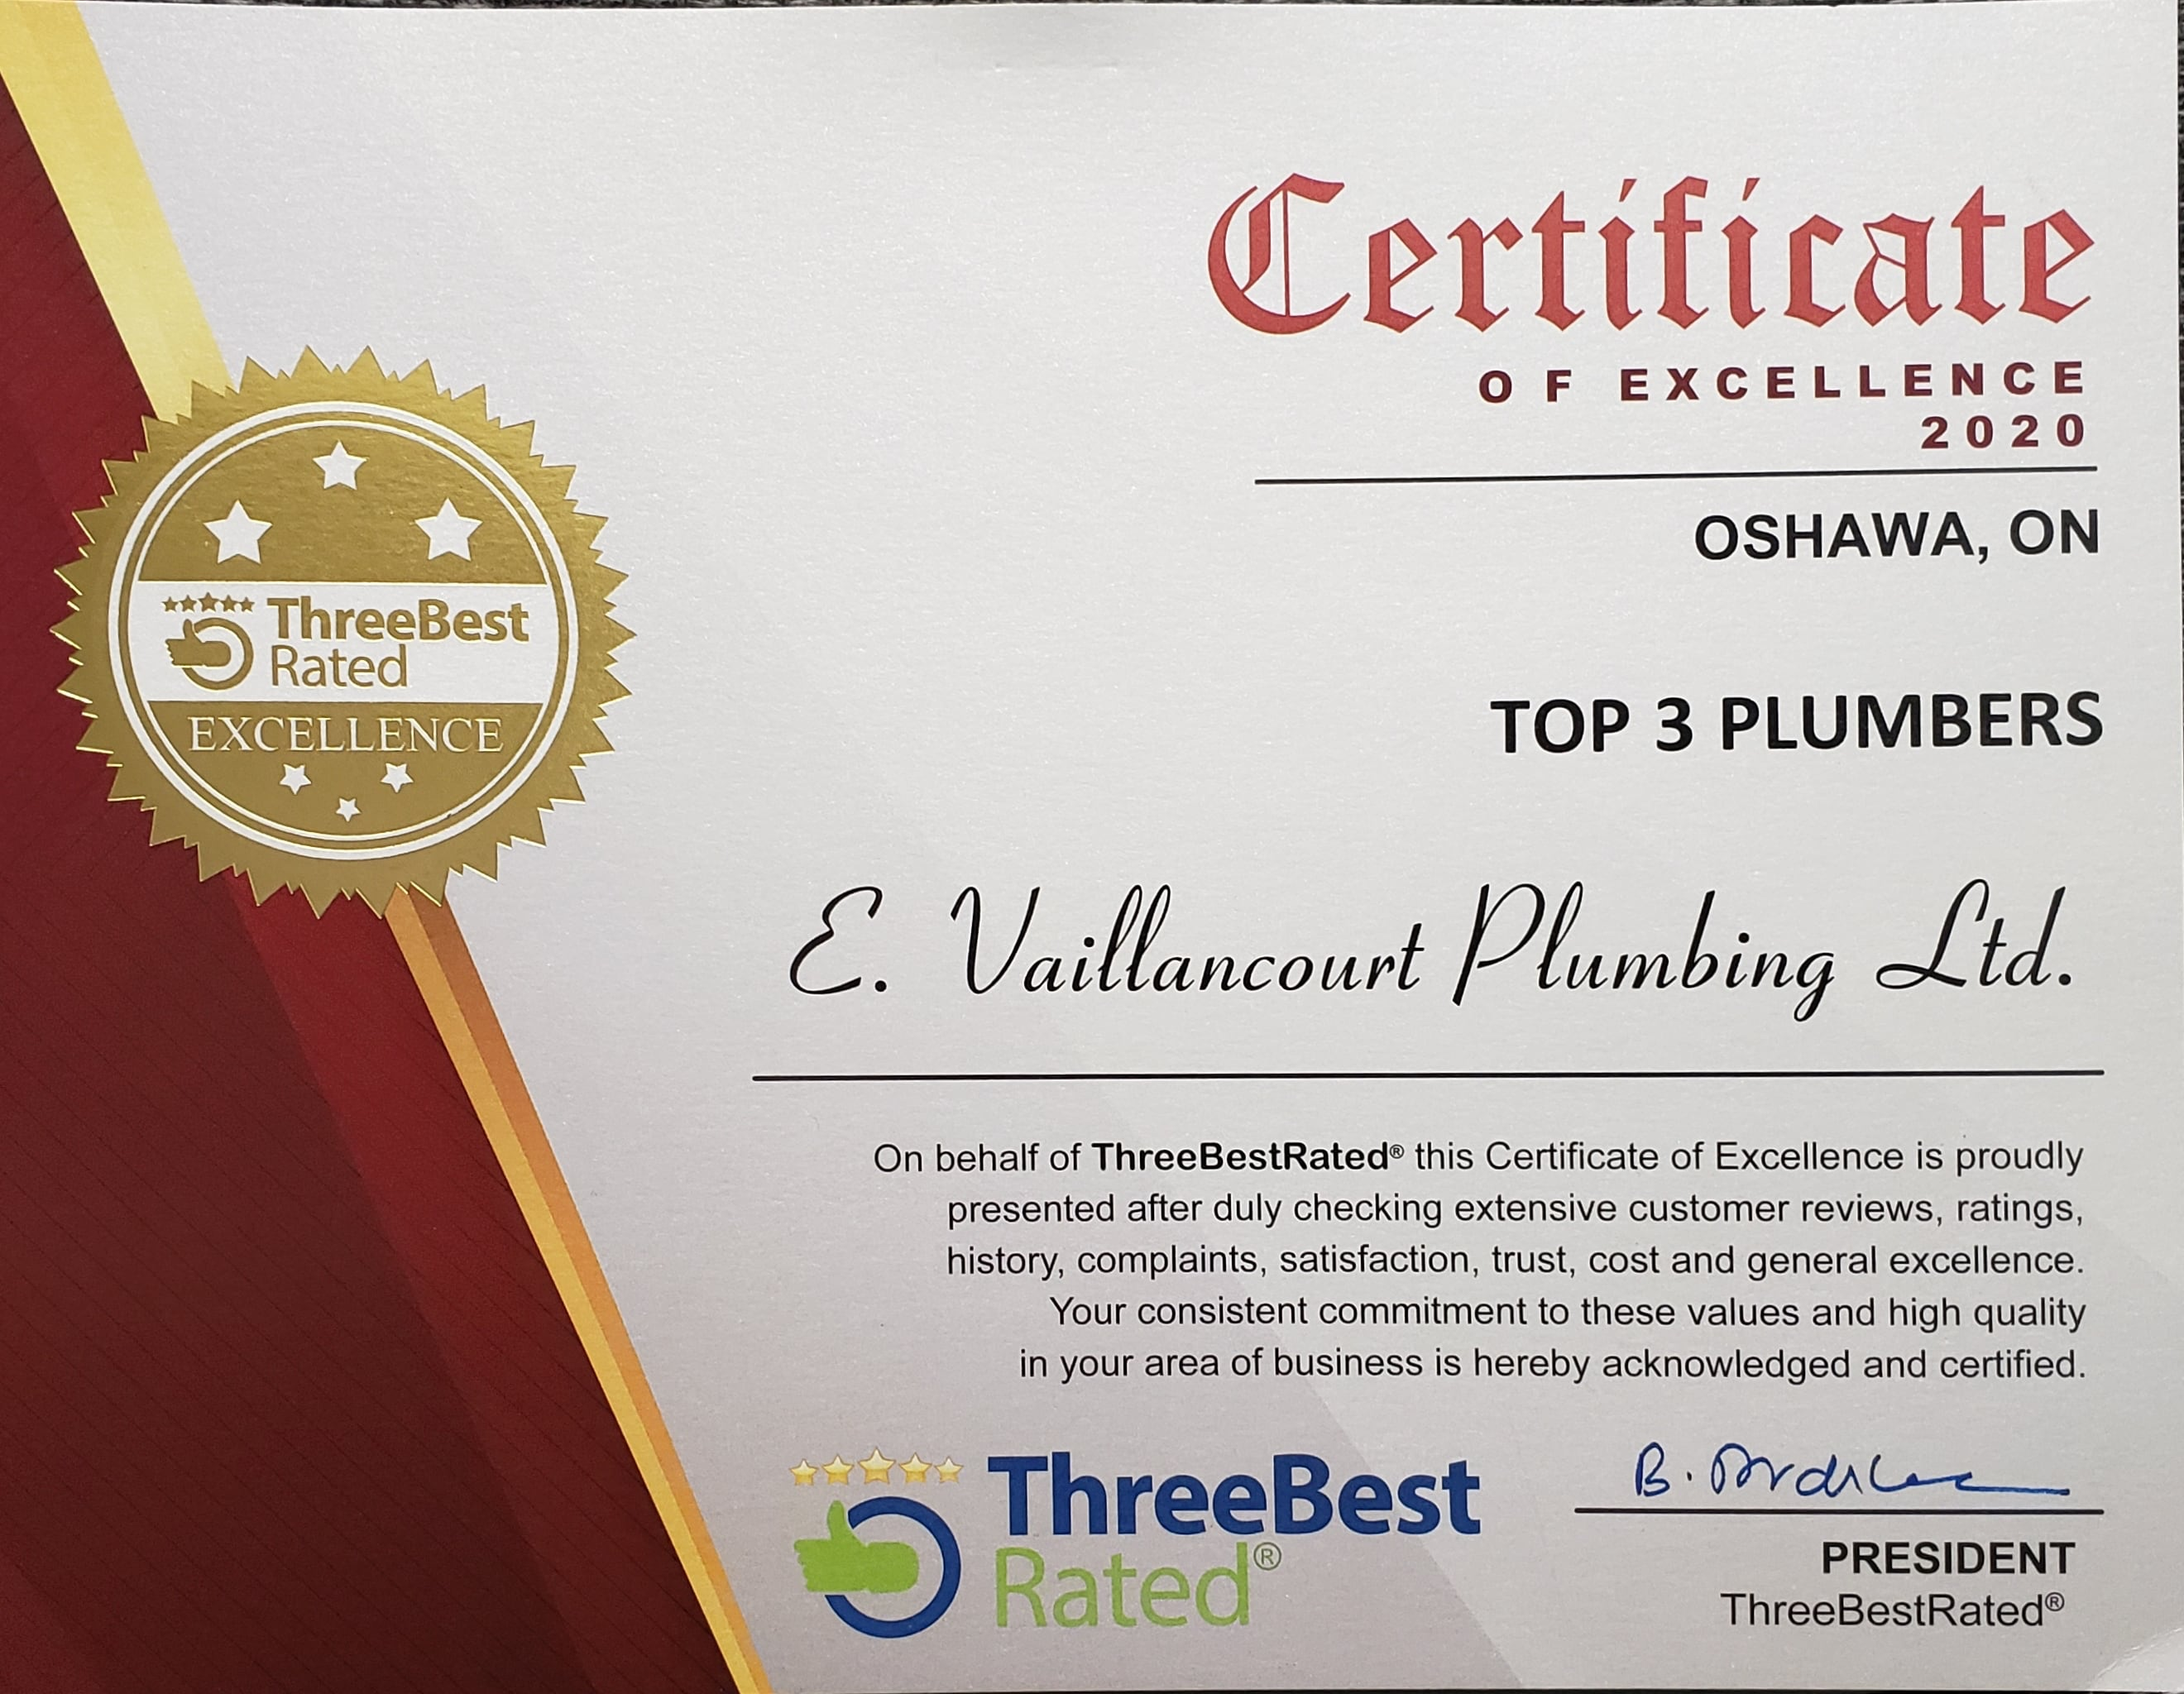 3 Best Certificate - E. Vaillancourt Plumbing